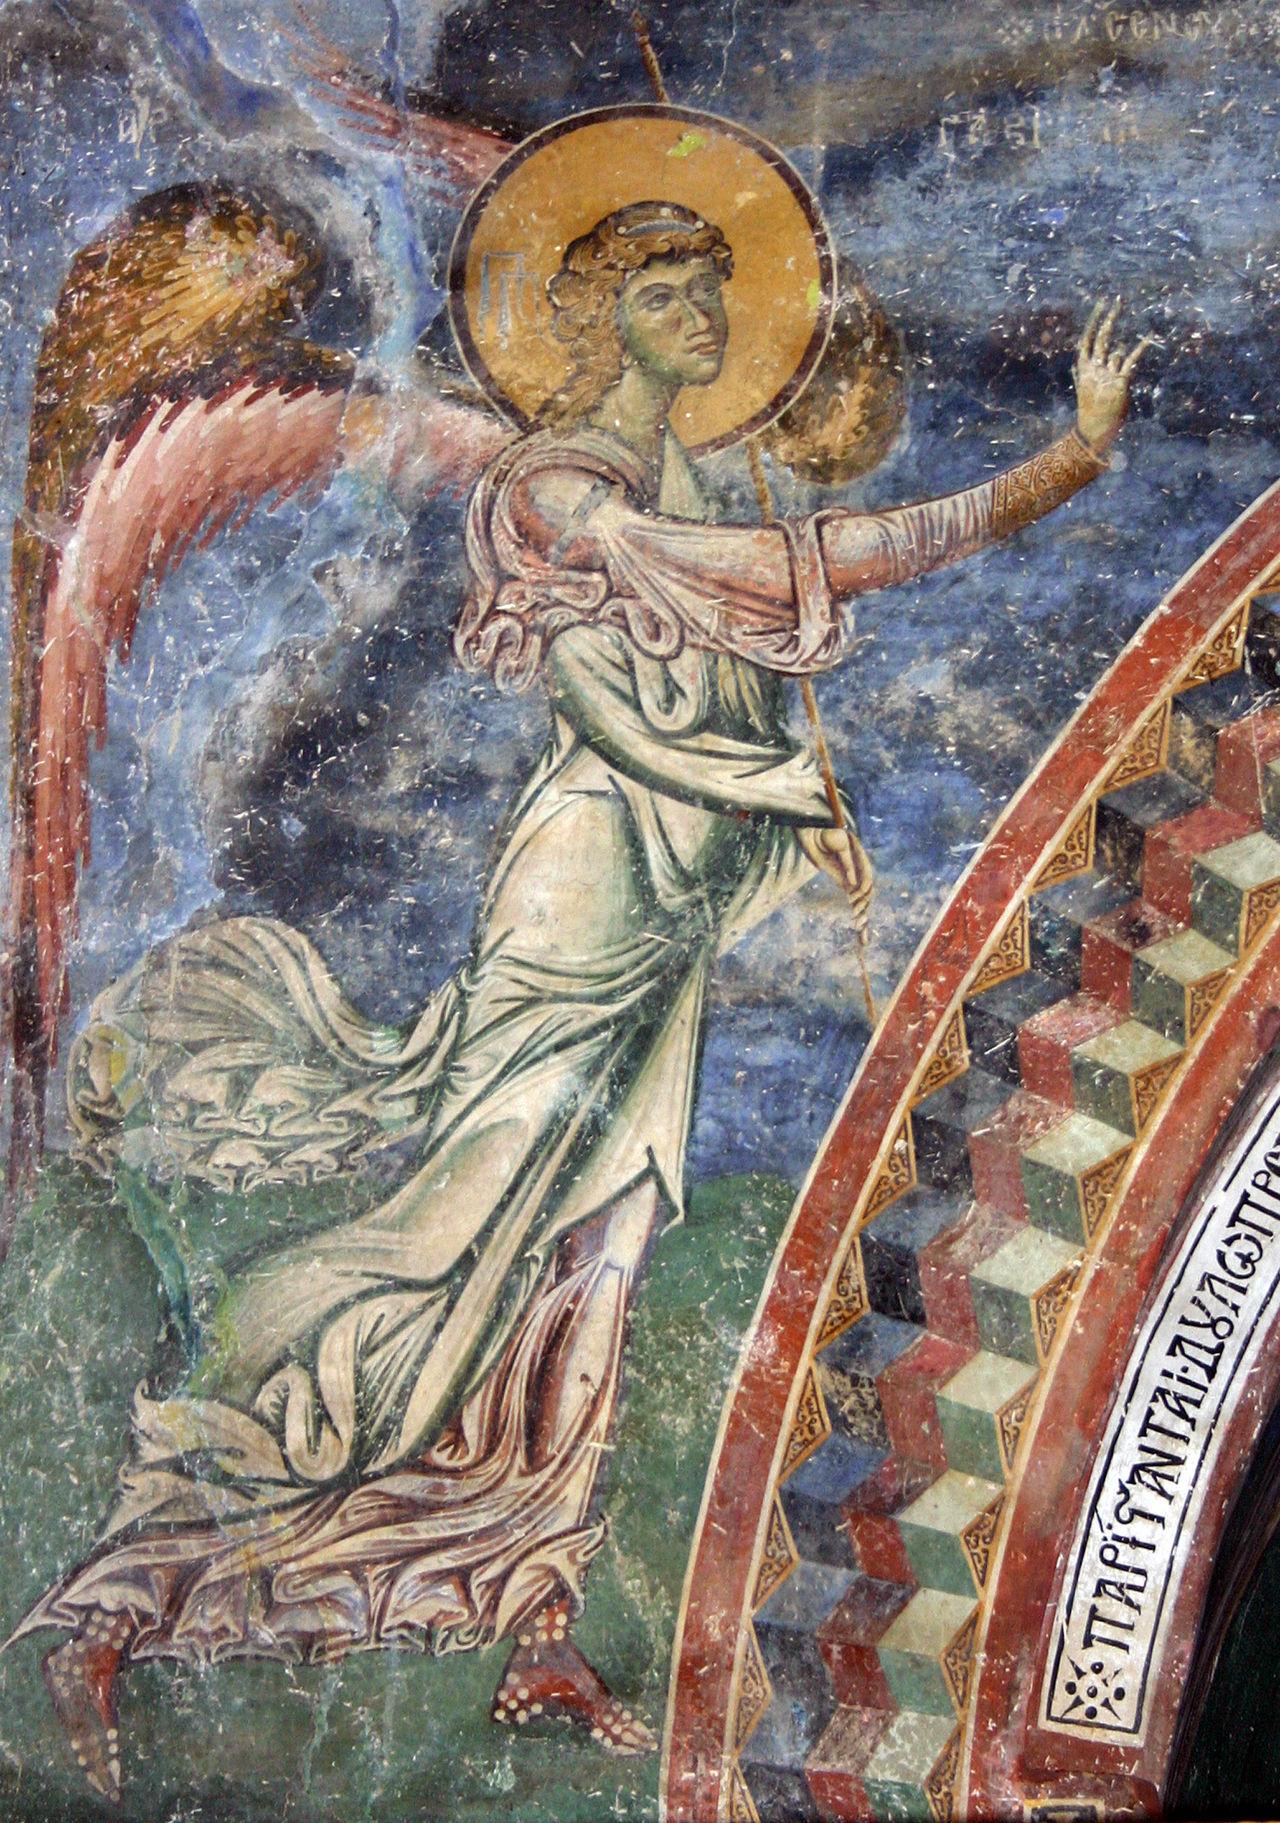 Ancient Angels Art Church Fresco Paintings Frescoes Kurbinovo Macedonia Macedonian Ohrid Painting Religion Resen Saints Skopje